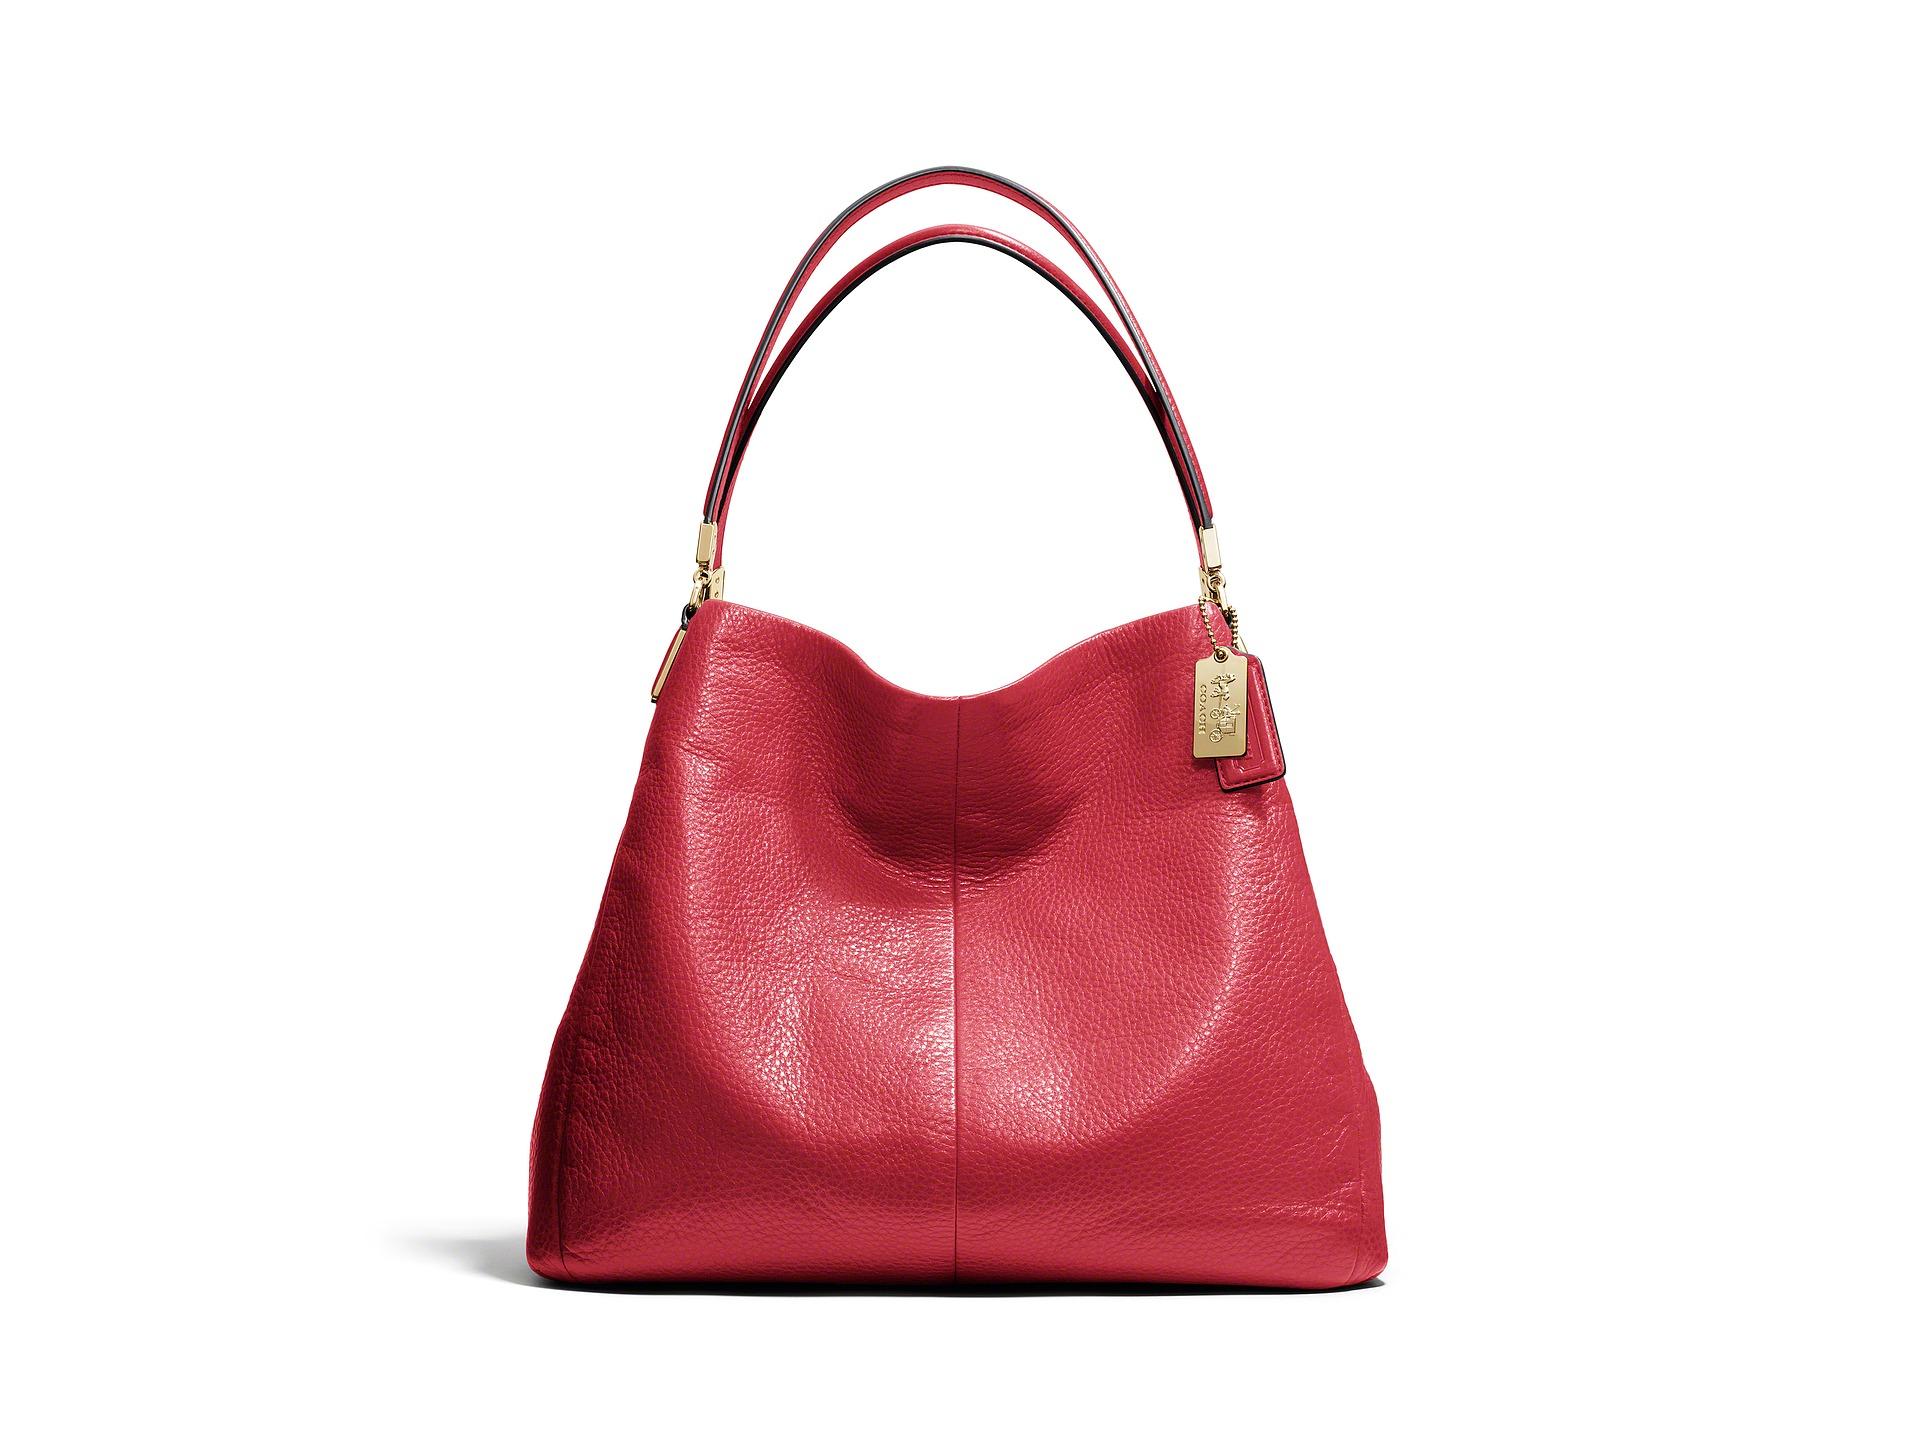 COACH Madison Leather Small Phoebe Shoulder Bag 寇驰 麦迪逊系列 女士单肩包 2013年秋季新款-奢品汇 | 海淘手表 | 腕表资讯